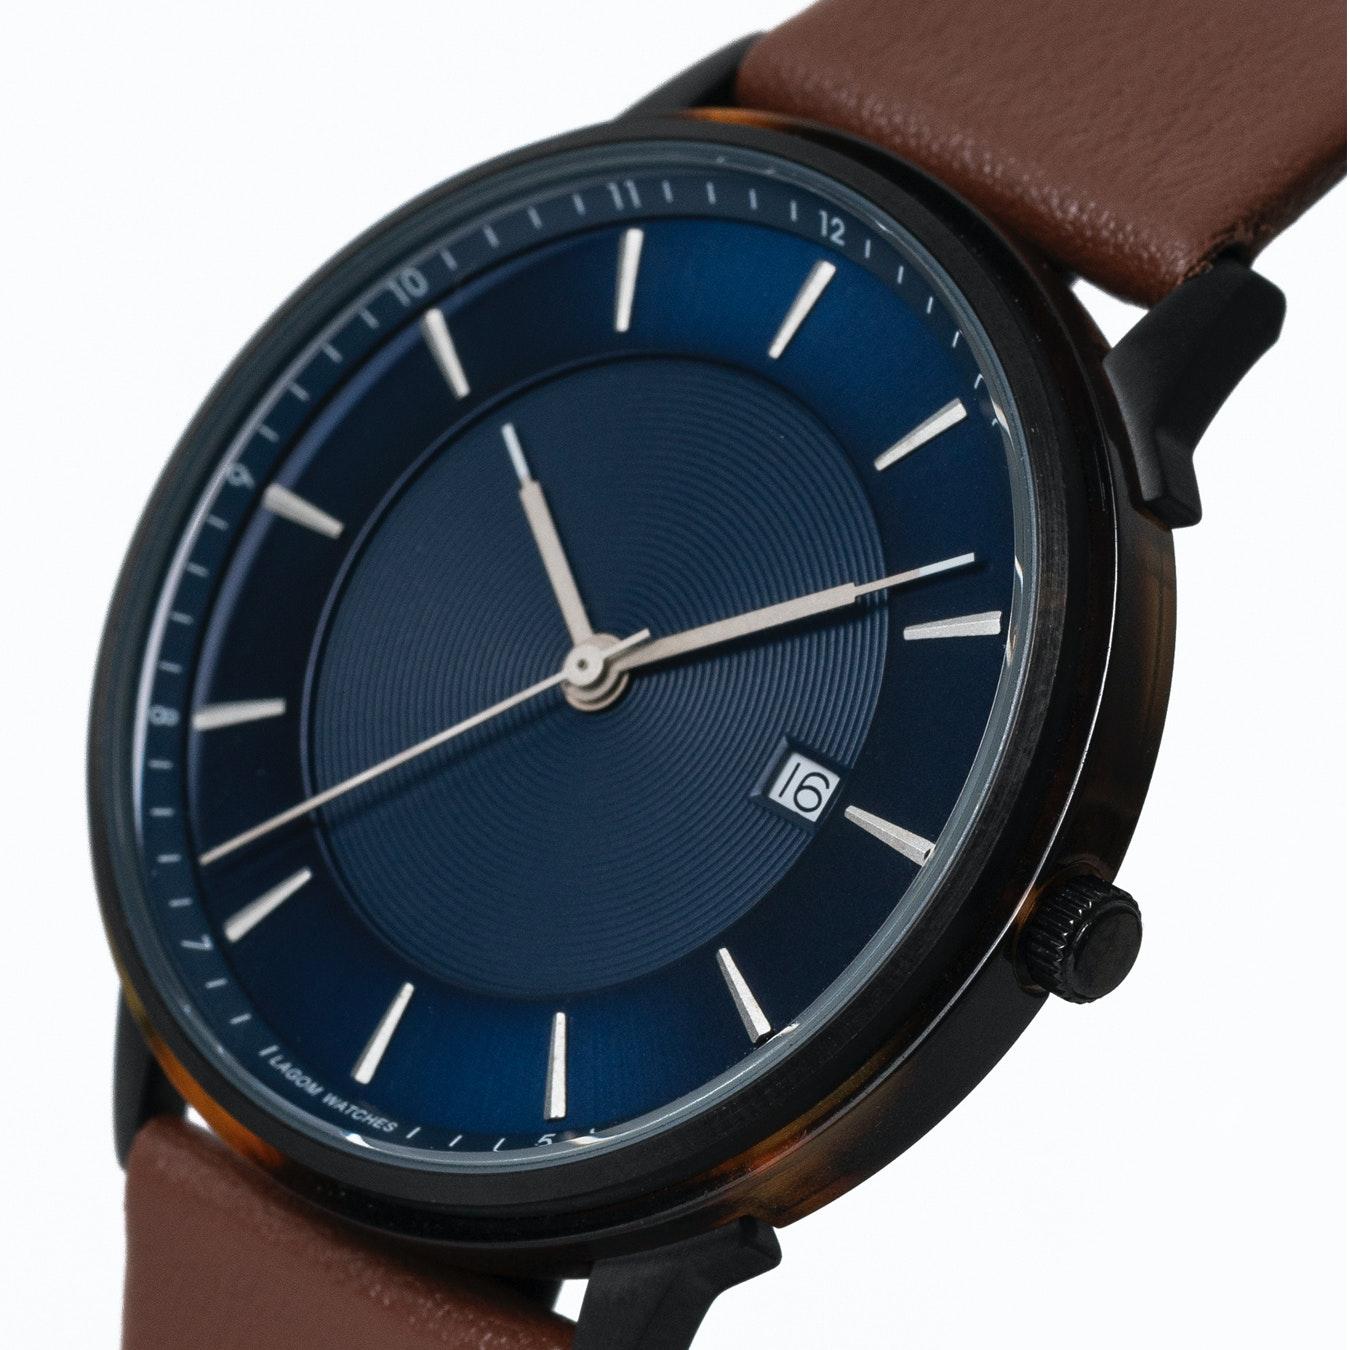 Borja Black Watch In Dark Blue Face Brown Leather Strap